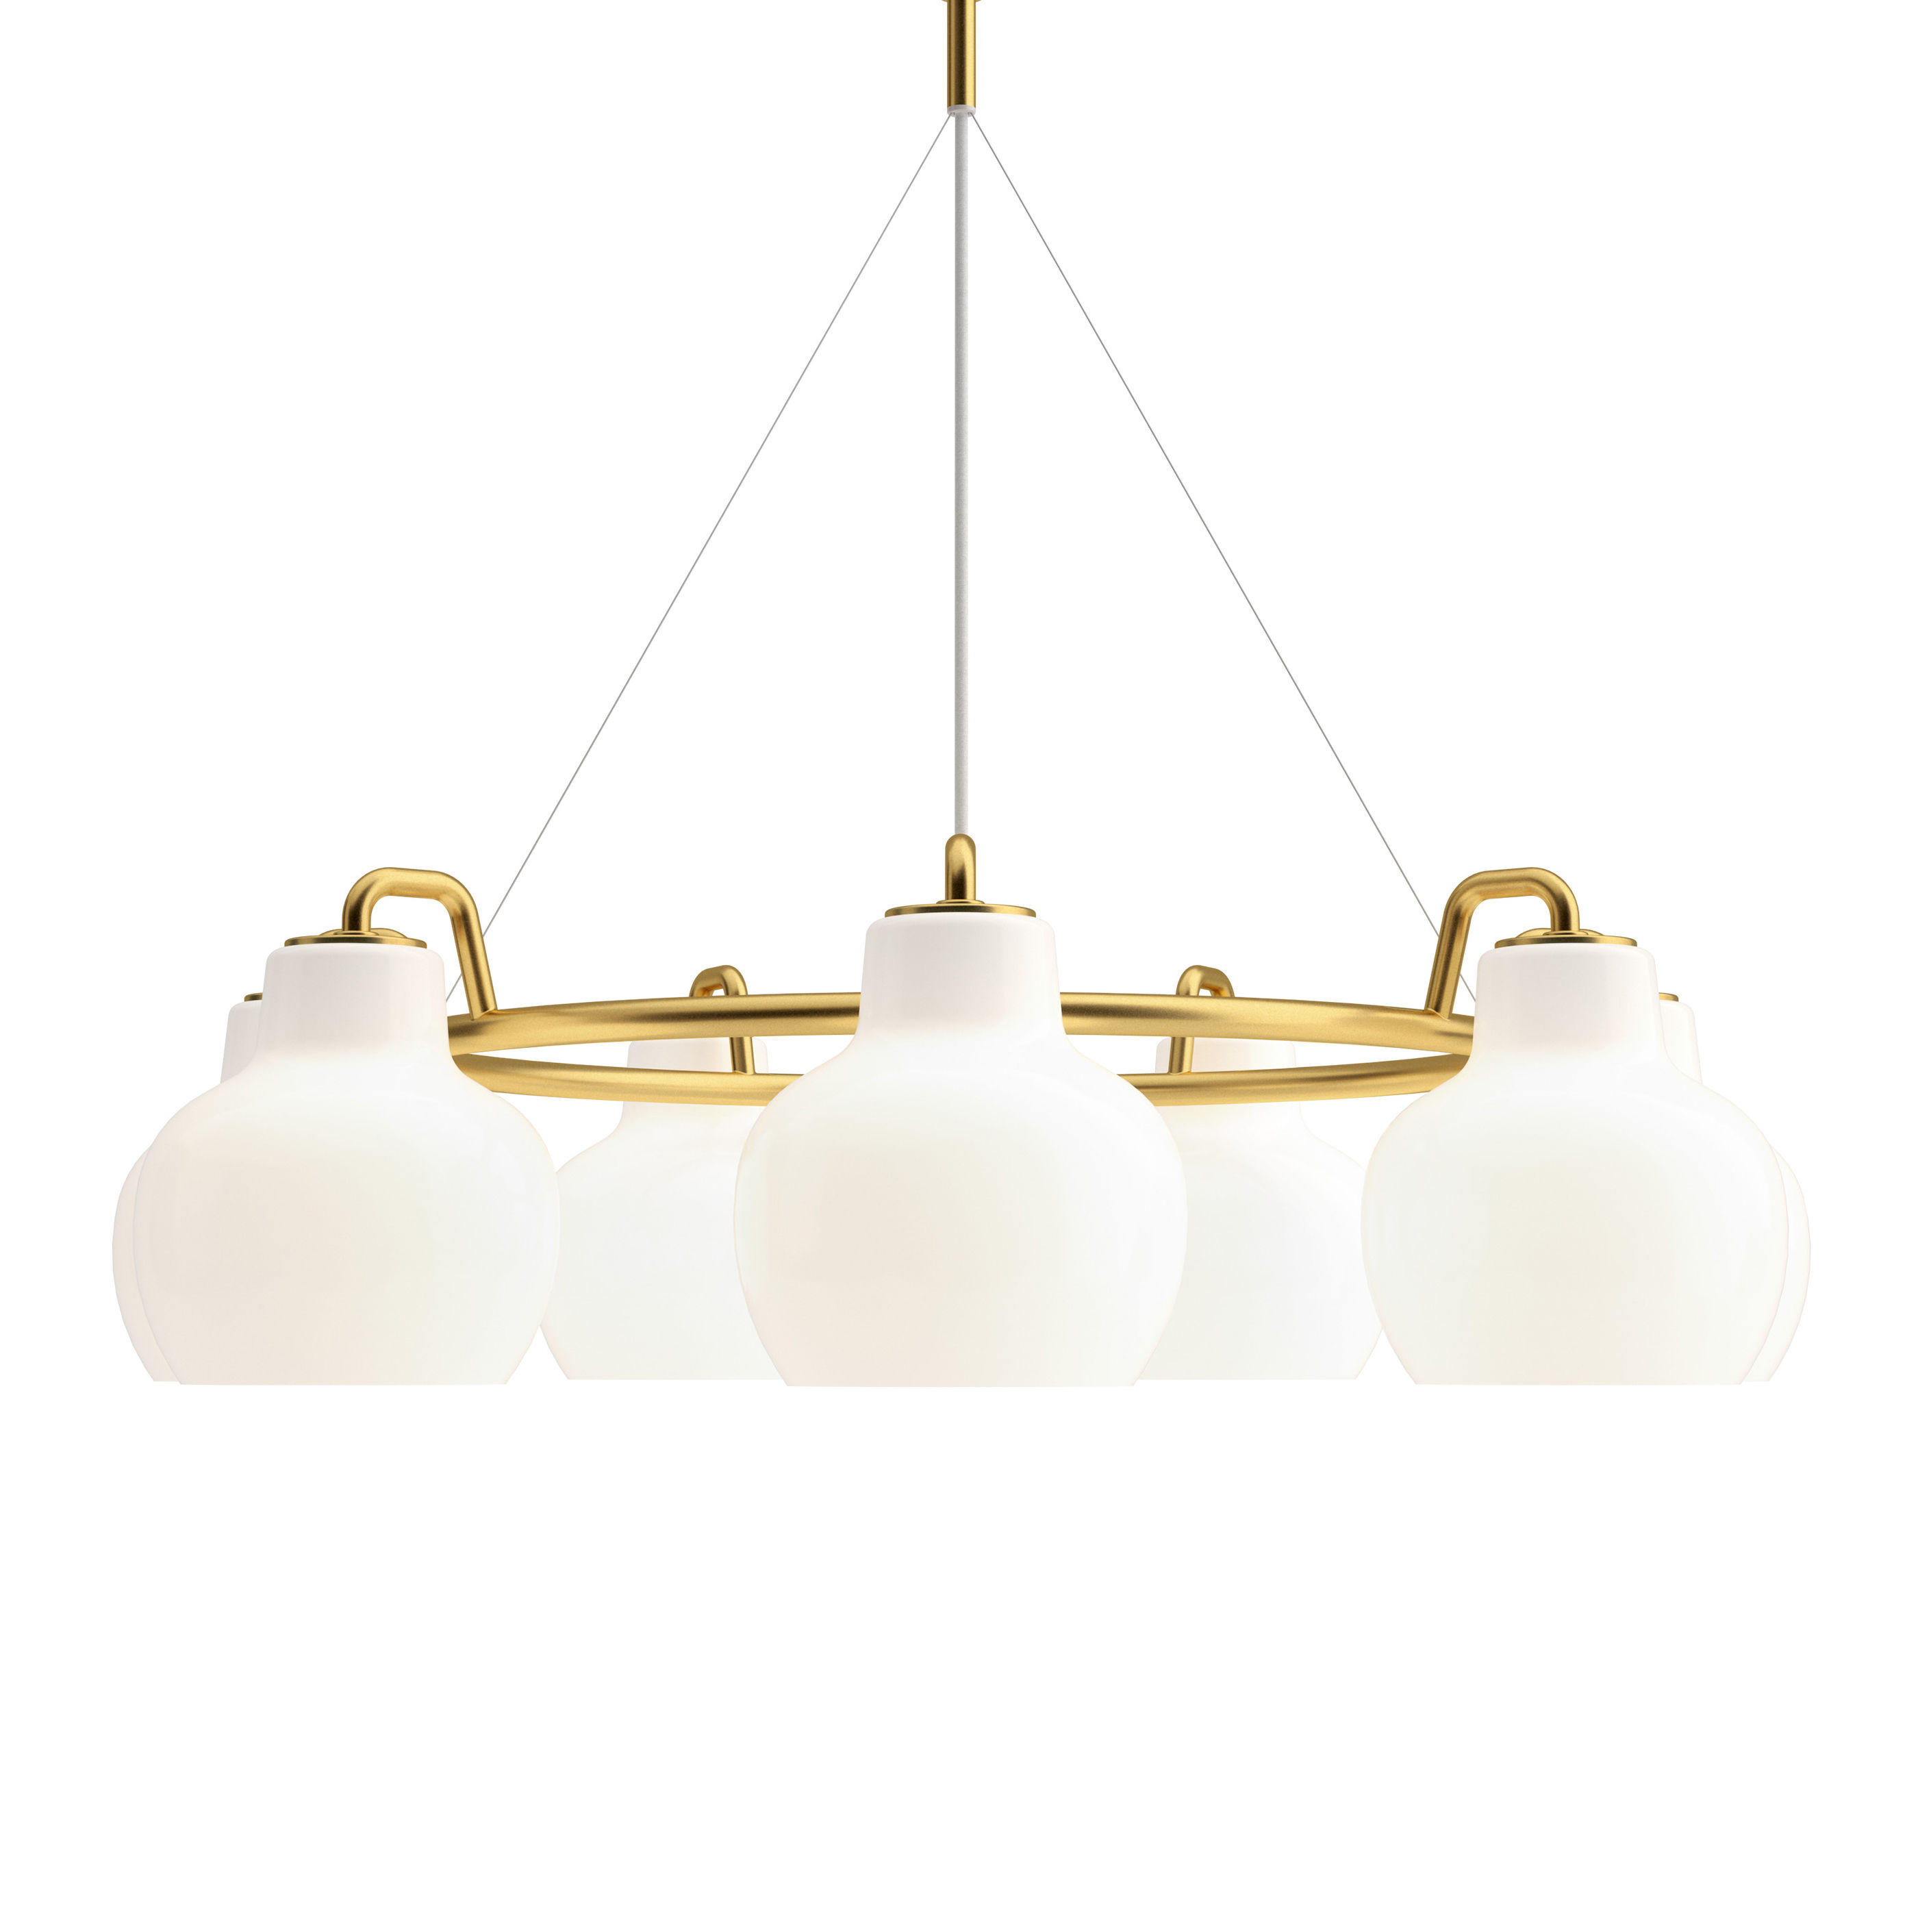 Lighting - Pendant Lighting - VL Ring Crown Pendant - / 7 lampshades - Ø 89 cm by Louis Poulsen - White / Brass - Brass, Mouth blown glass